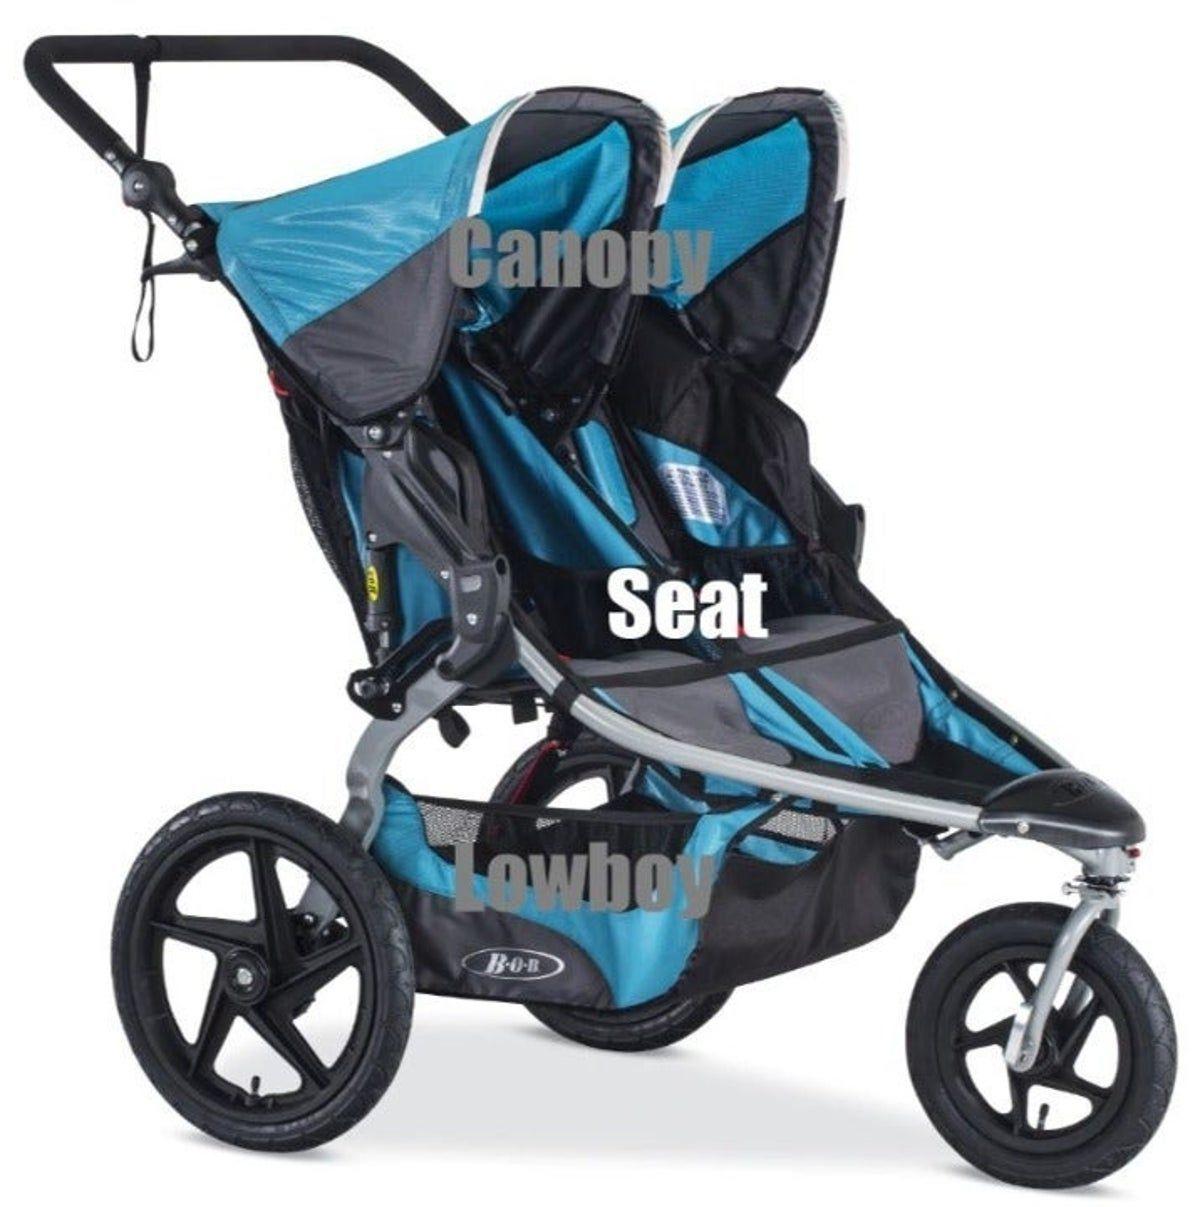 BOB SEAT, Revolution Flex, Duallie/Lagoo Get the perfect